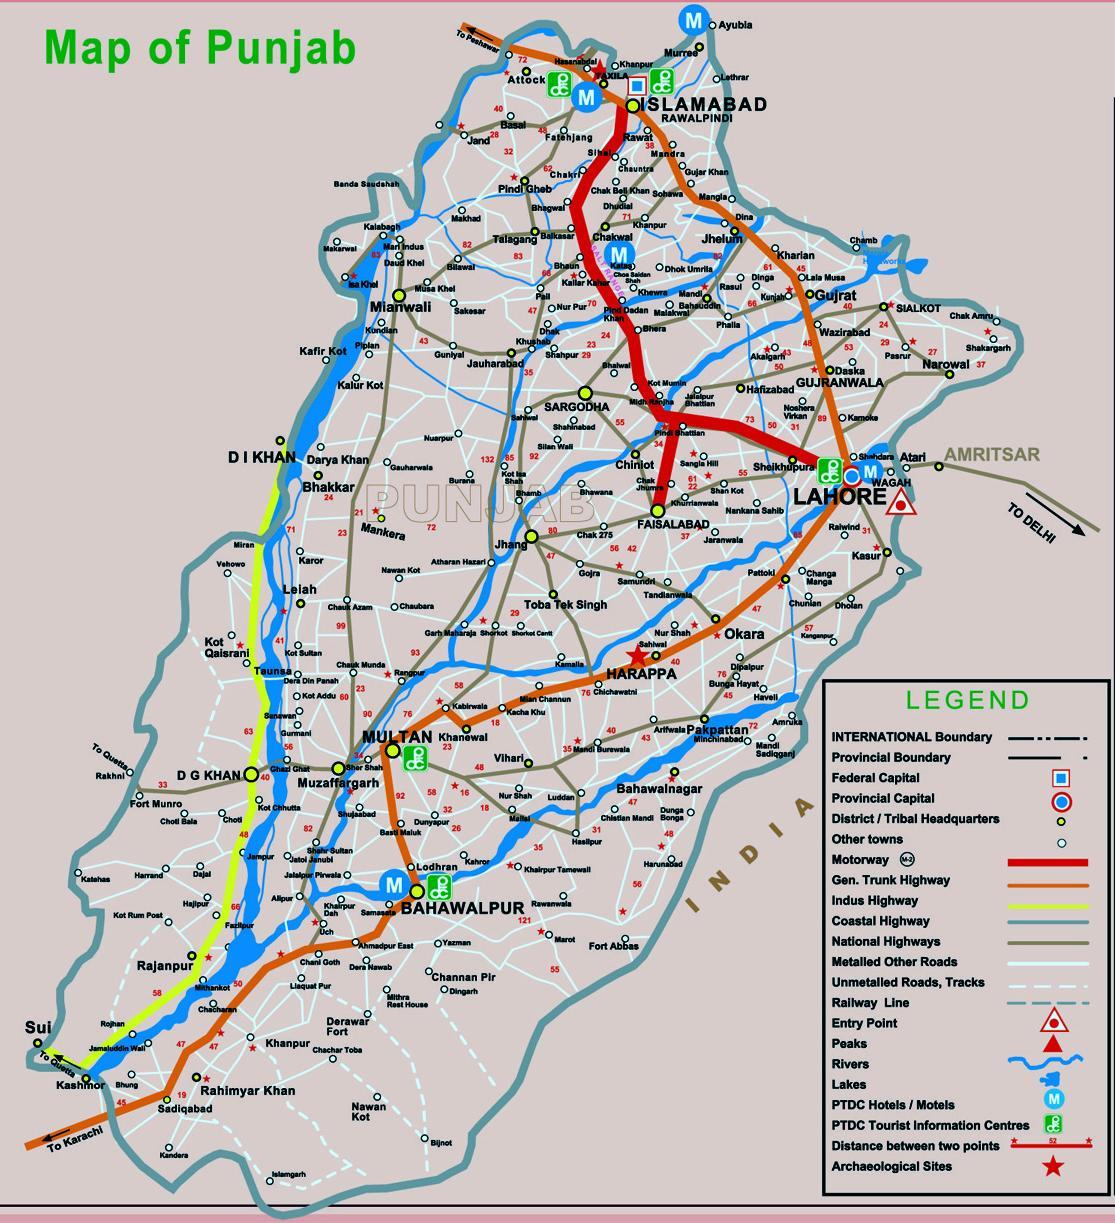 Pakistan Map The maps of Pakistan